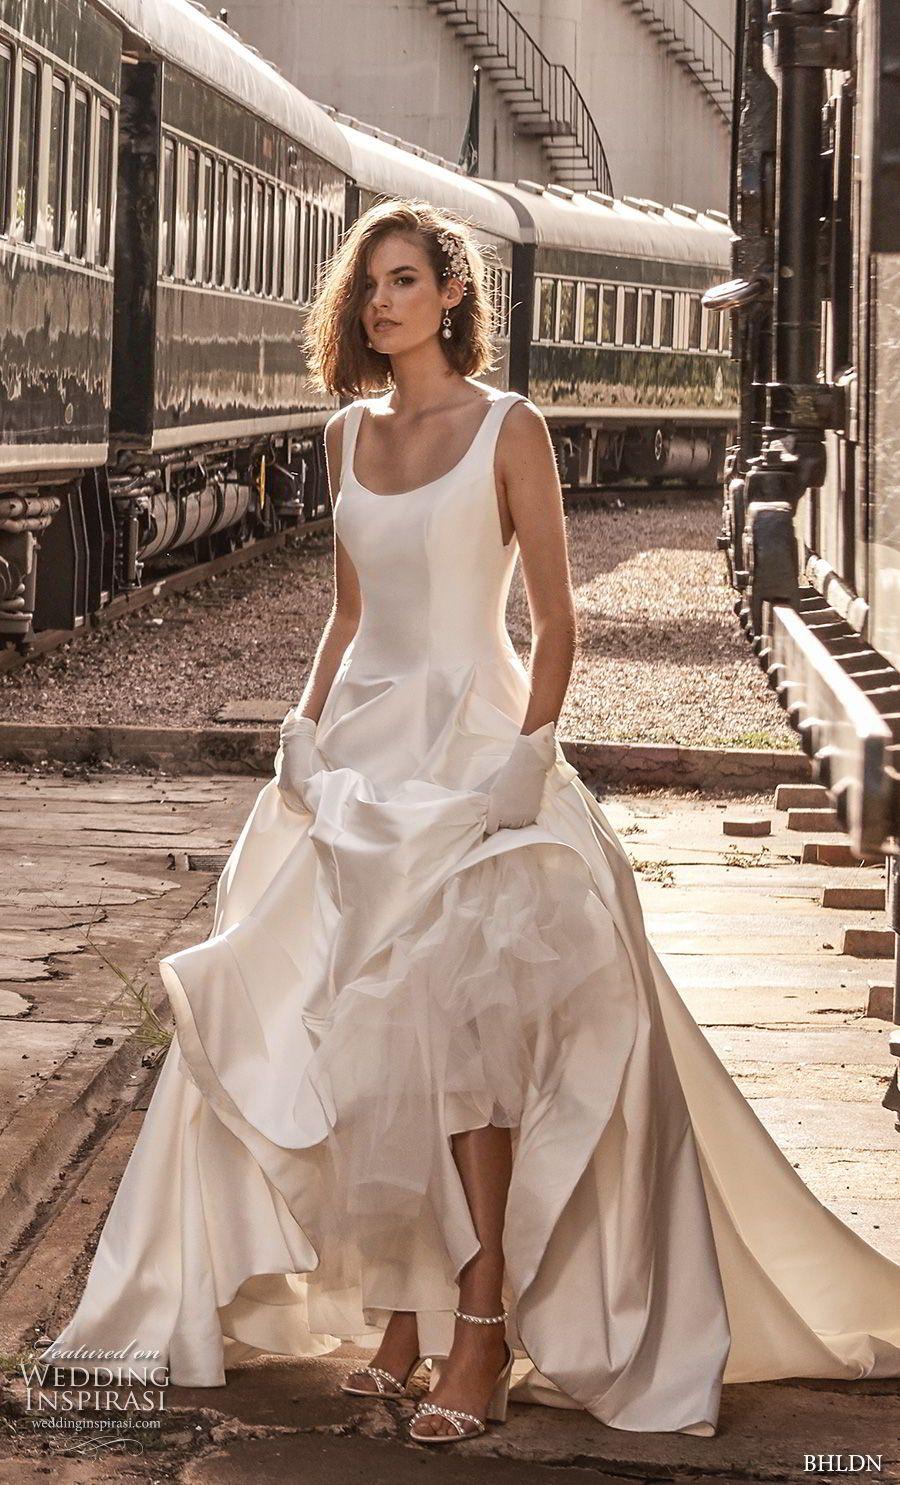 bhldn 2018 weg Braut sleeveless Rundhalsausschnitt einfach sauber ...